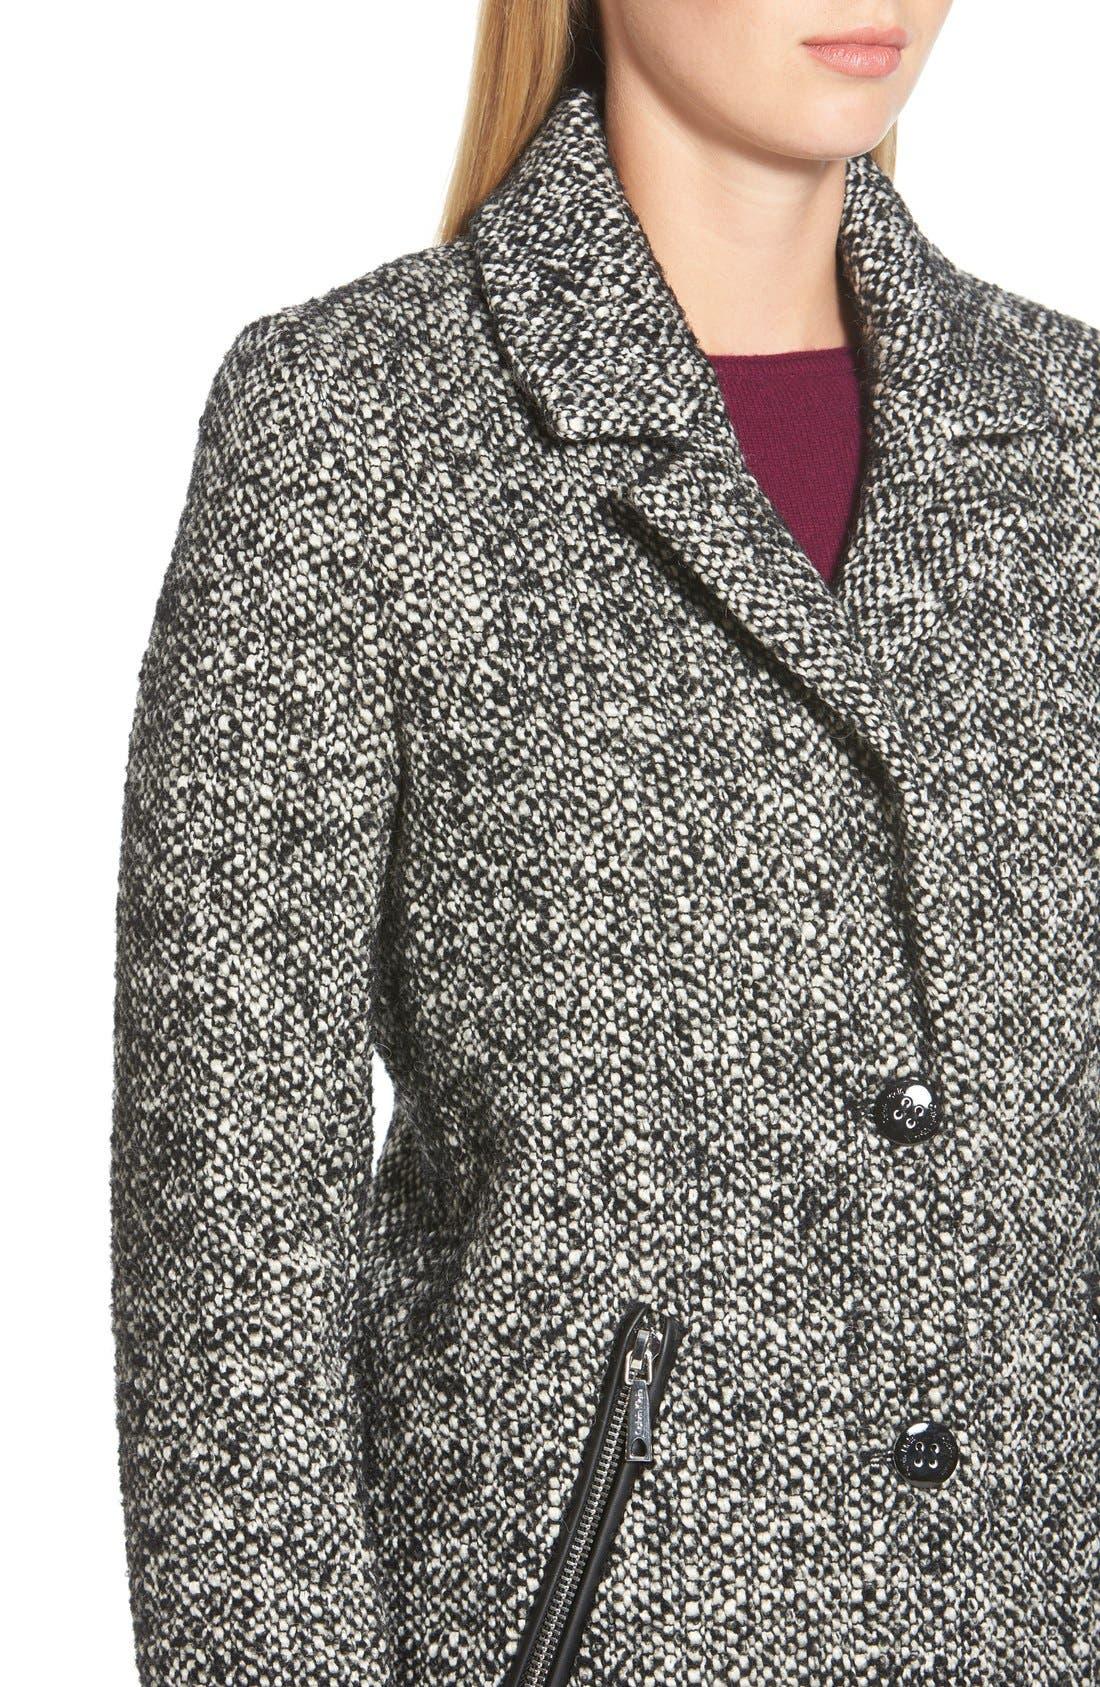 Tweed Walking Coat,                             Alternate thumbnail 6, color,                             081